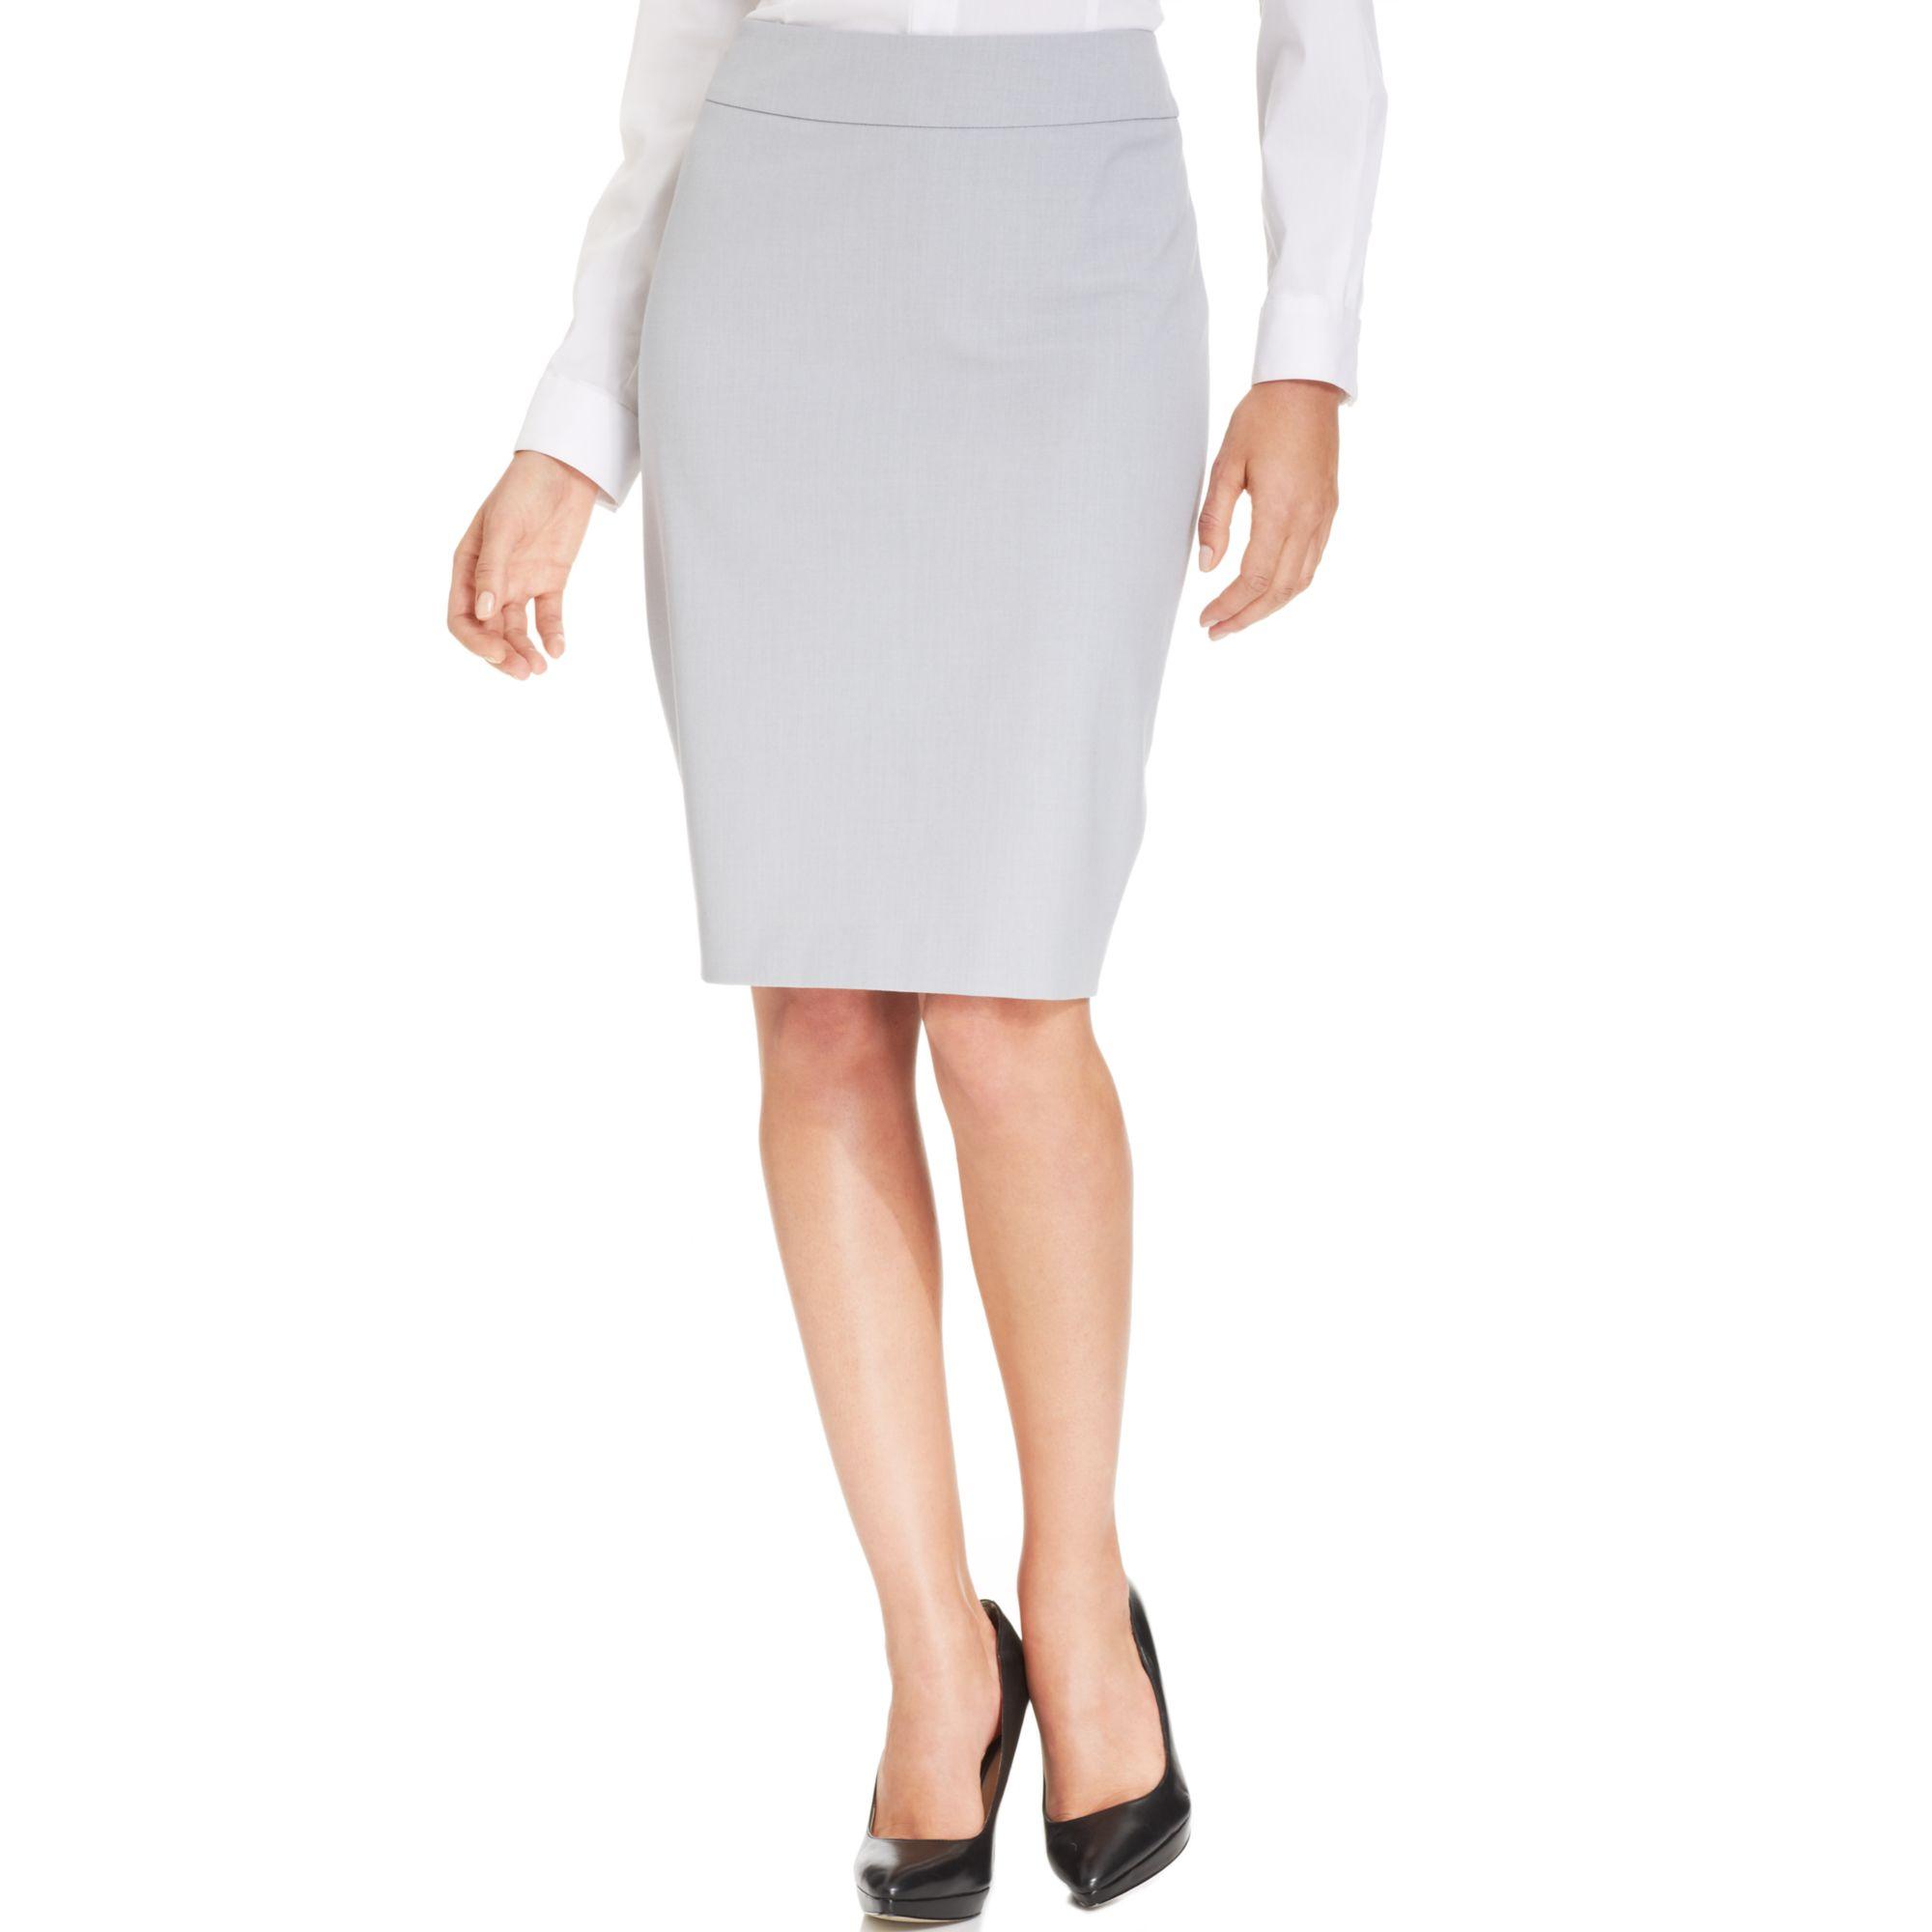 jones new york pencil skirt in gray light grey